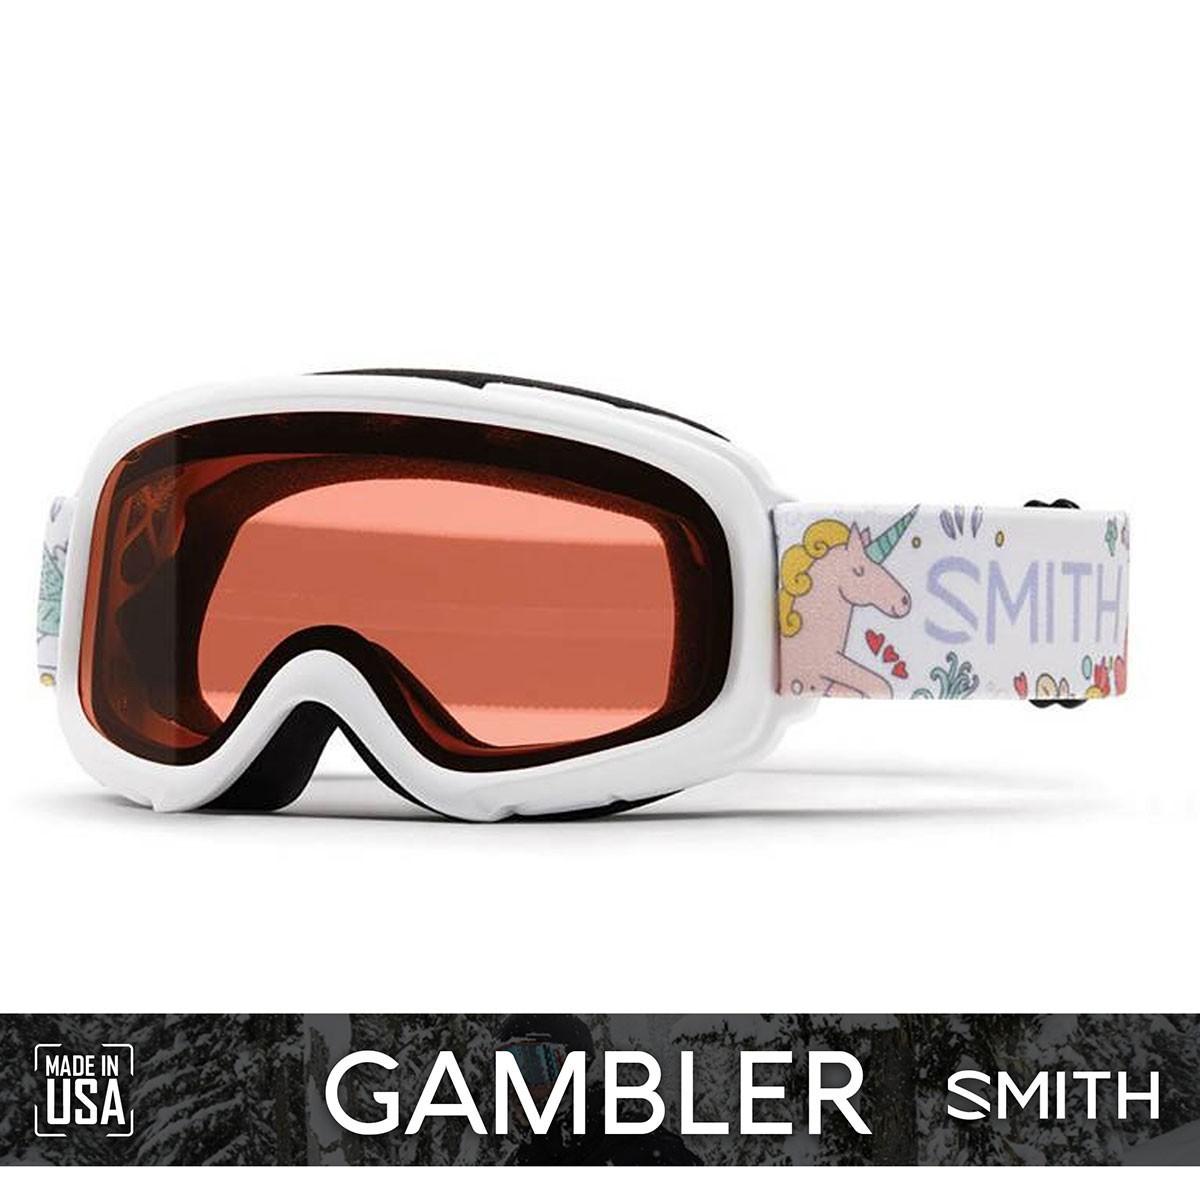 SMITH GAMBLER AIR Whitefairyt   S2 RC36 ROSEC - Изображение - AQUAMATRIX